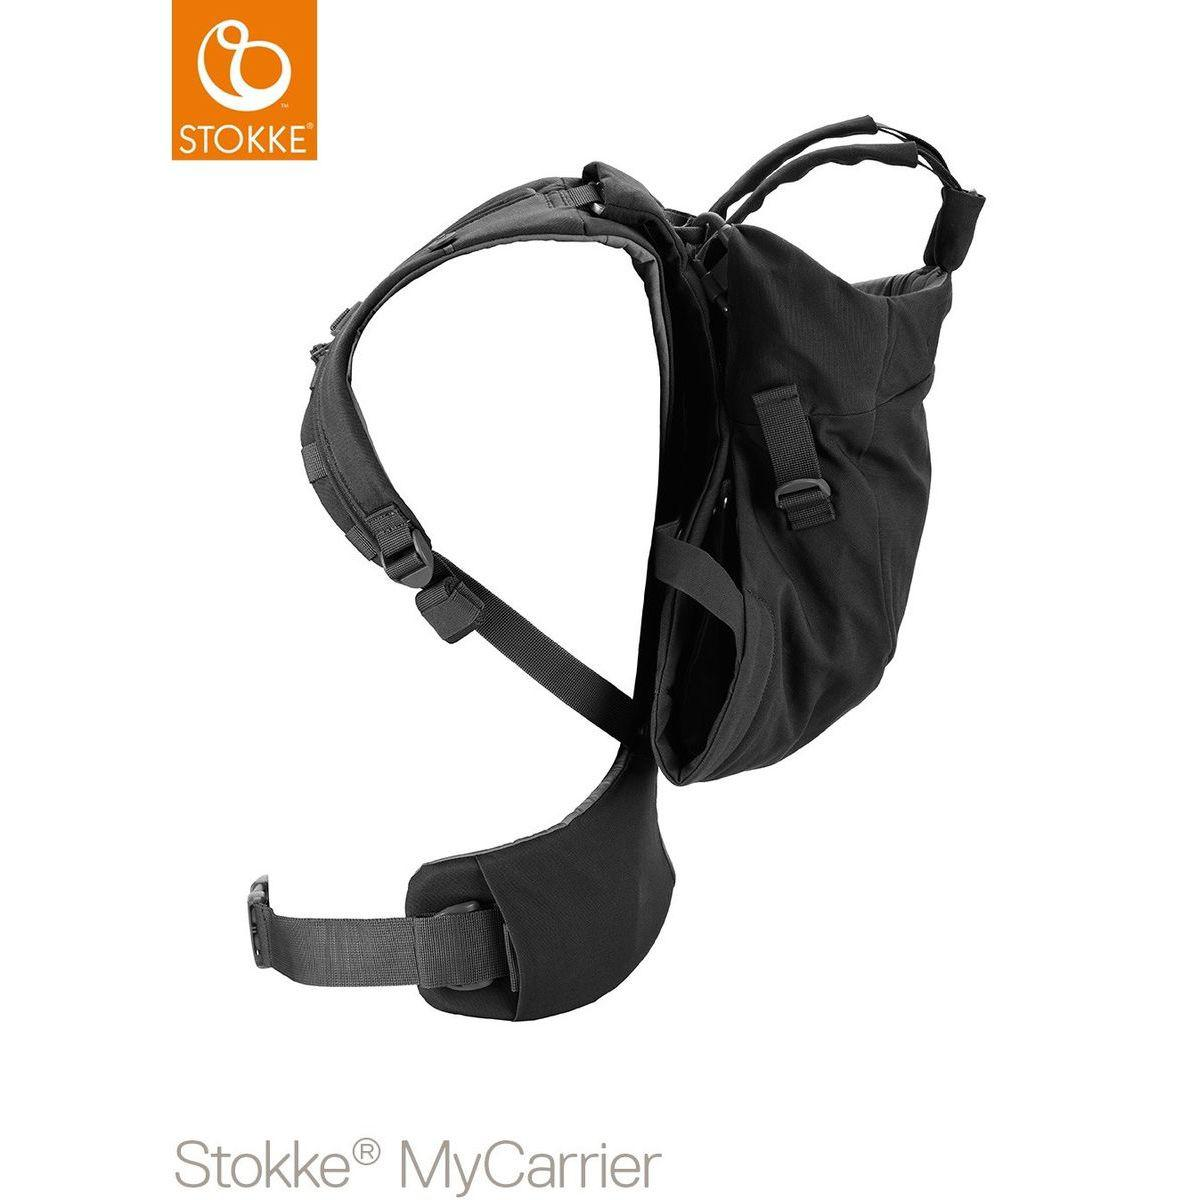 Portabebé frontal-dorsal MYCARRIER Stokke negro